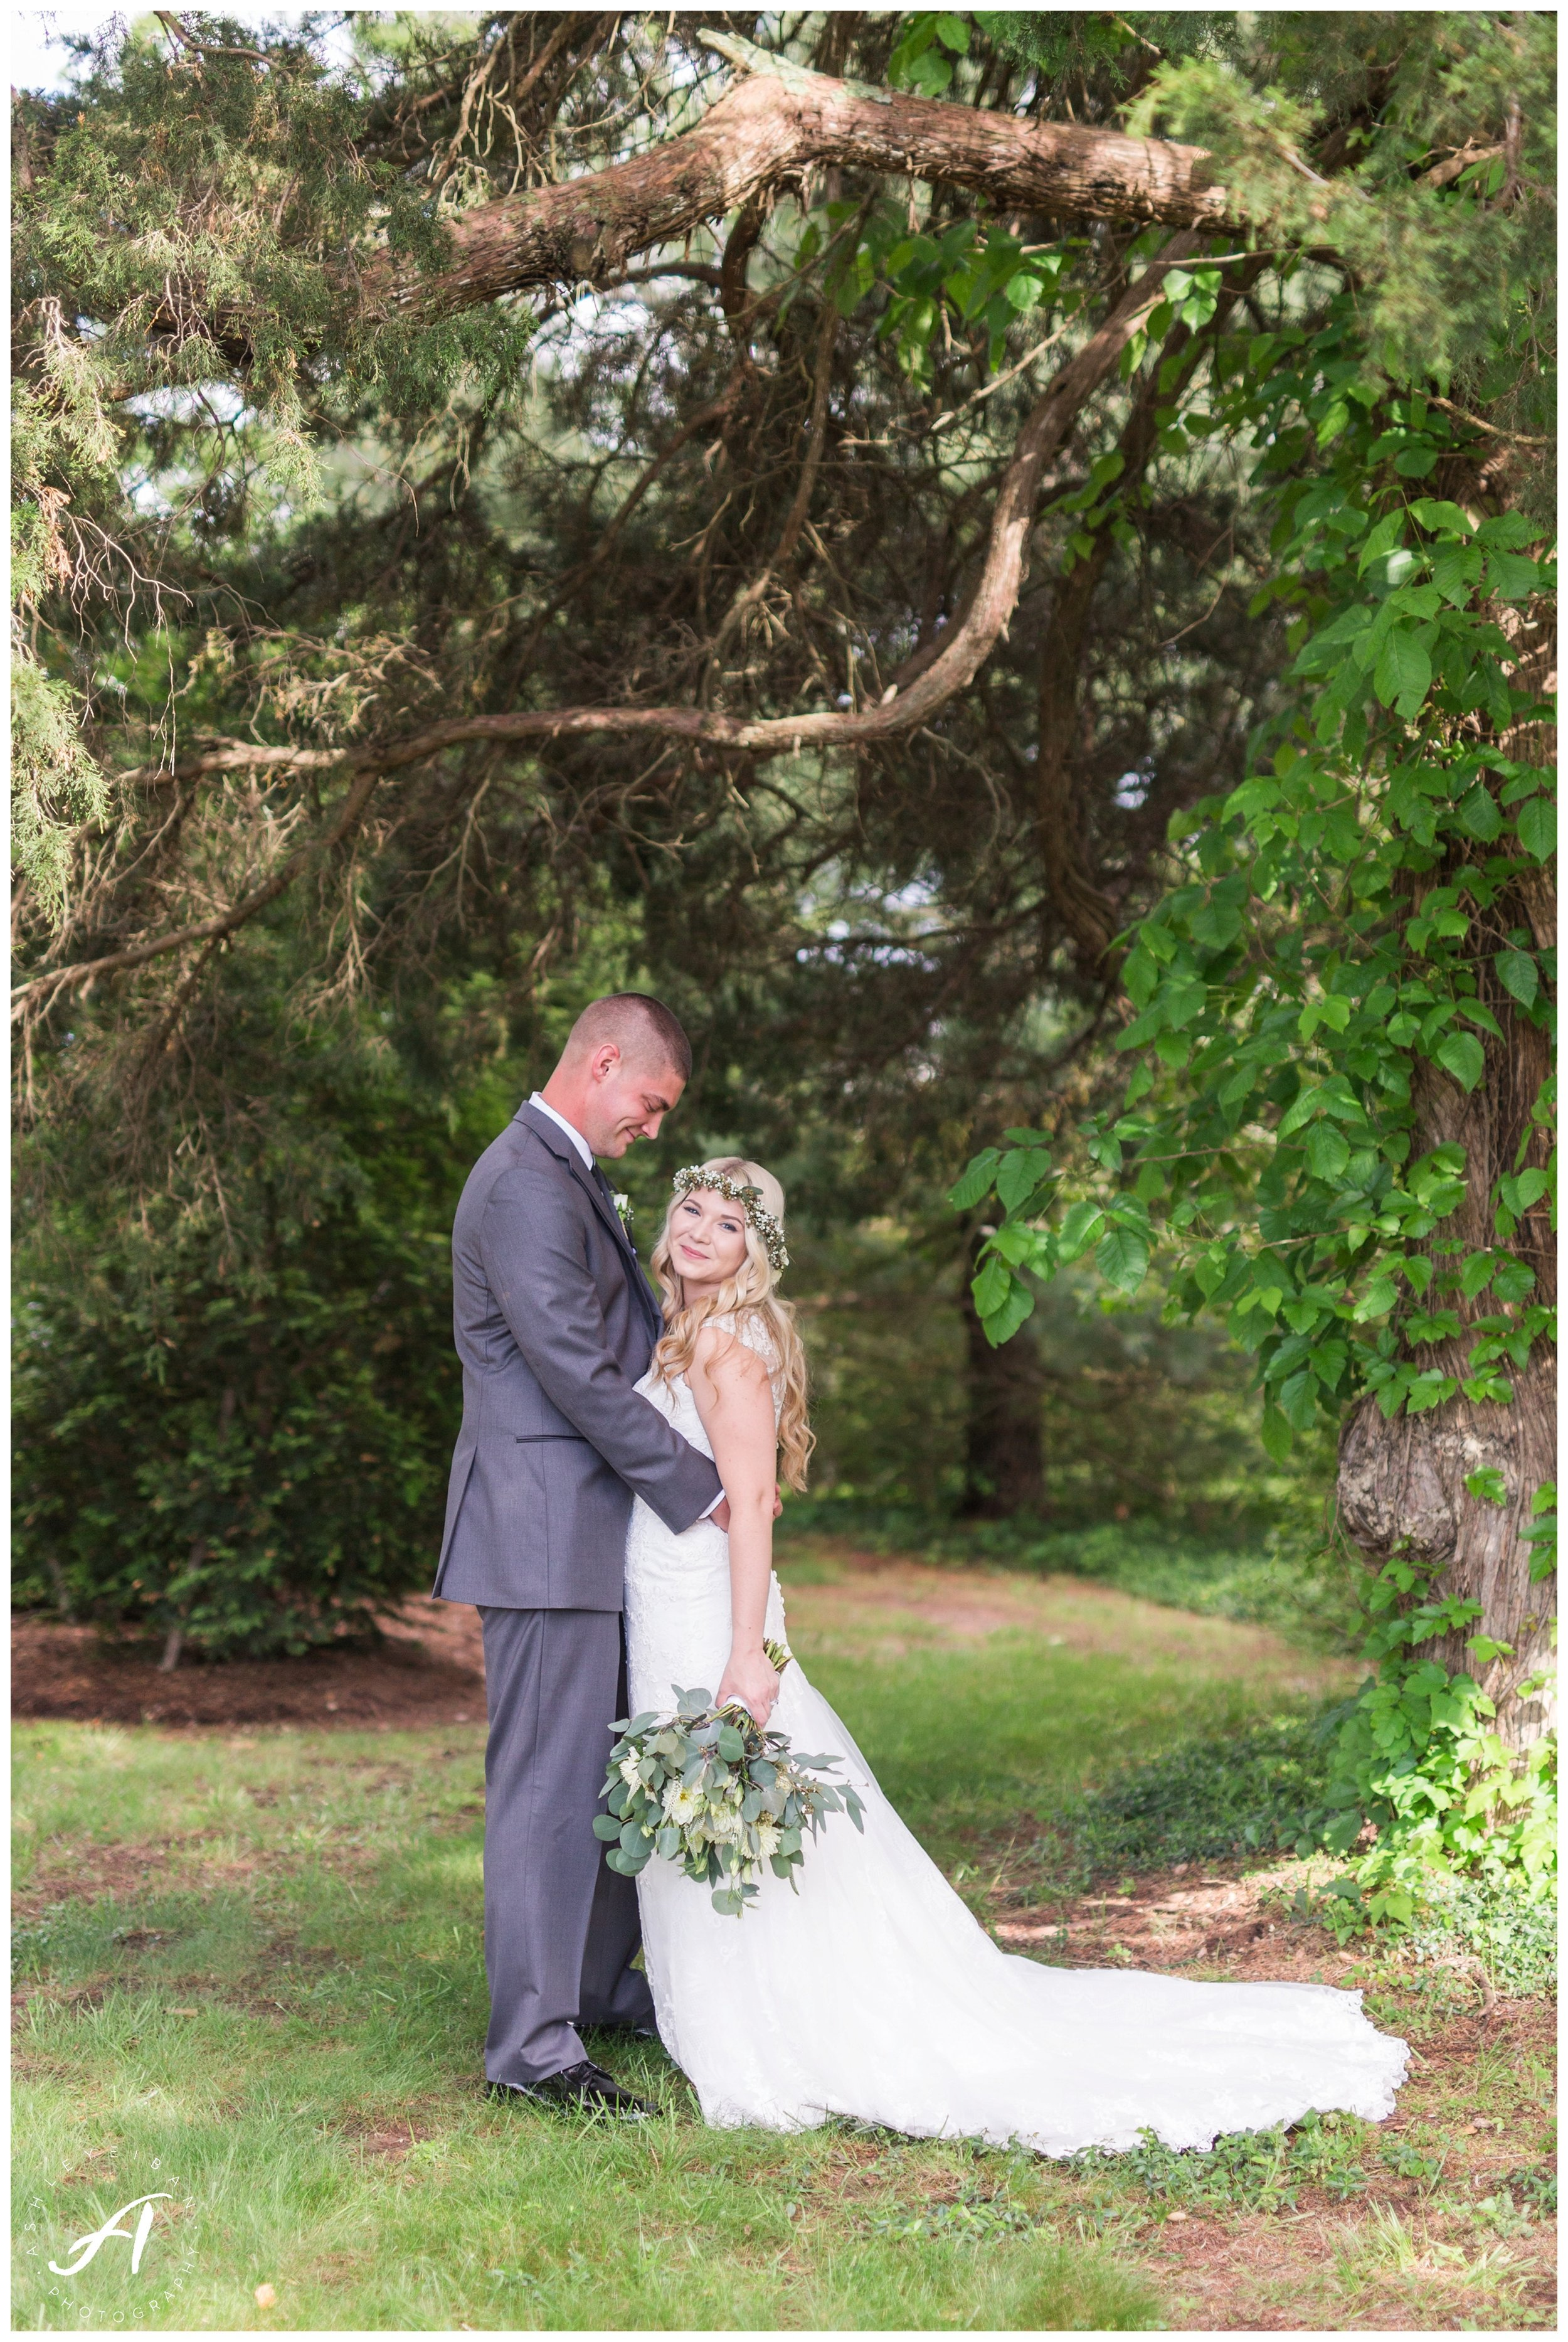 Write here…Lynchburg Virginia Wedding Photographer || Central Virginia Wedding Photos || Ashley Eiban Photography || www.ashleyeiban.com || Early Mountain Vineyard Wedding